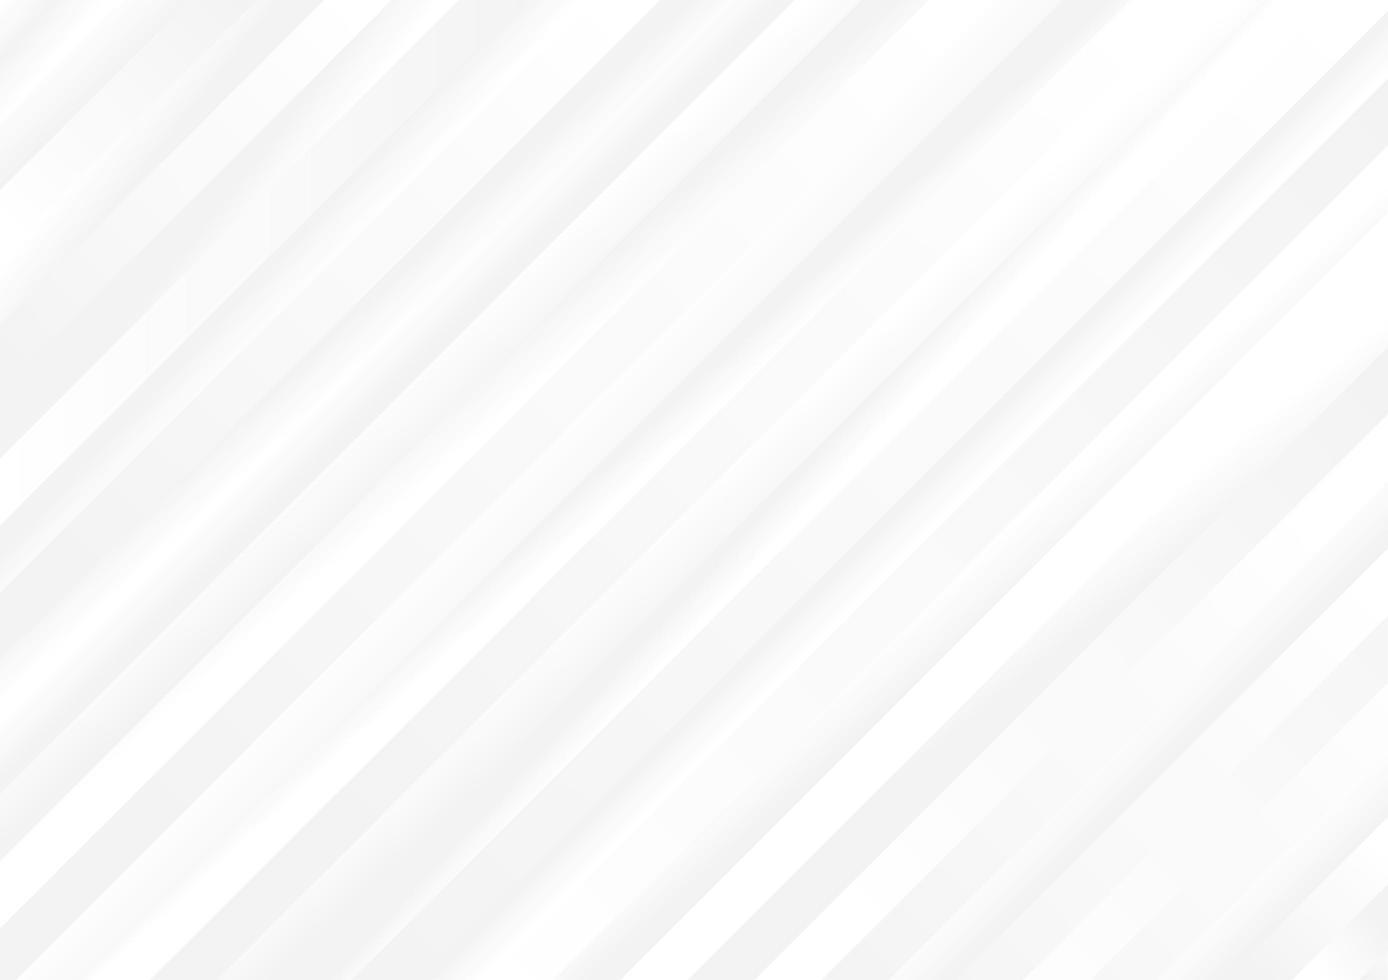 línea blanca de fondo vector